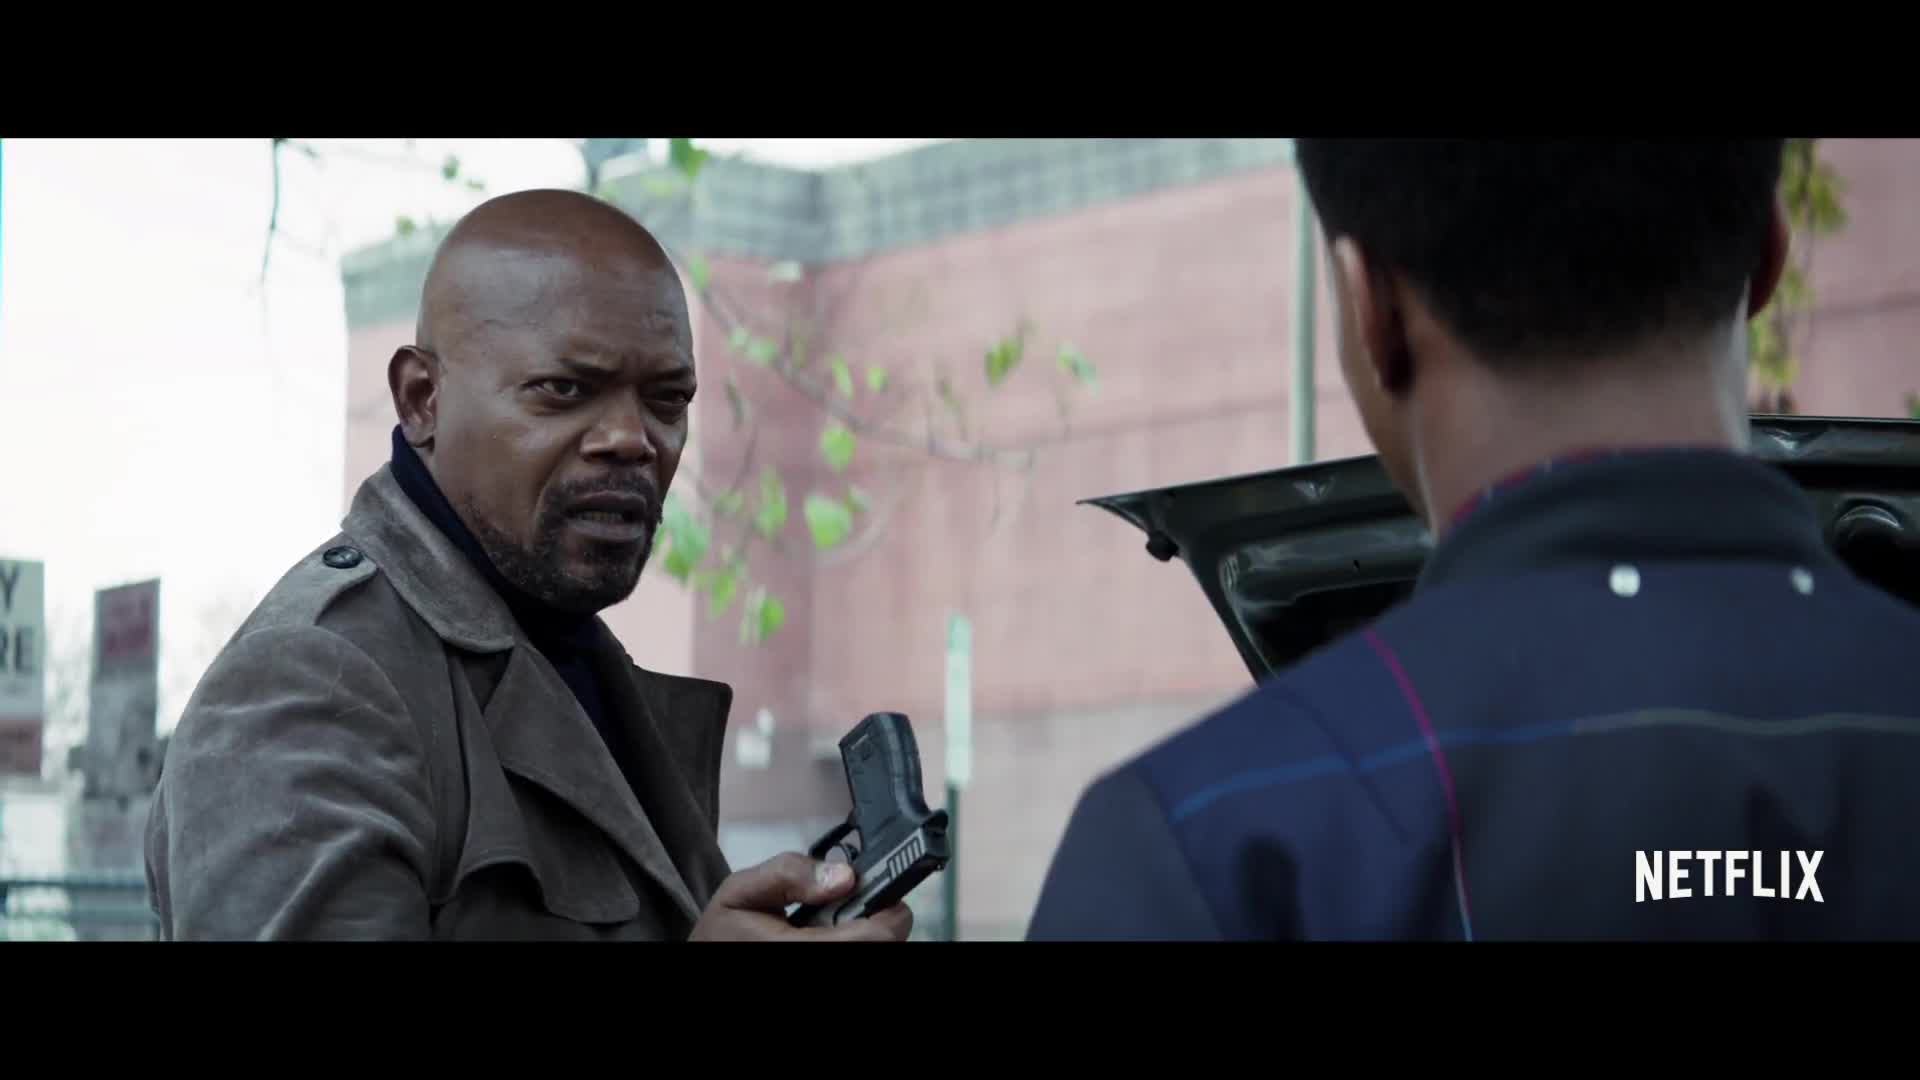 Trailer, Film, Netflix, Samuel L. Jackson, Shaft